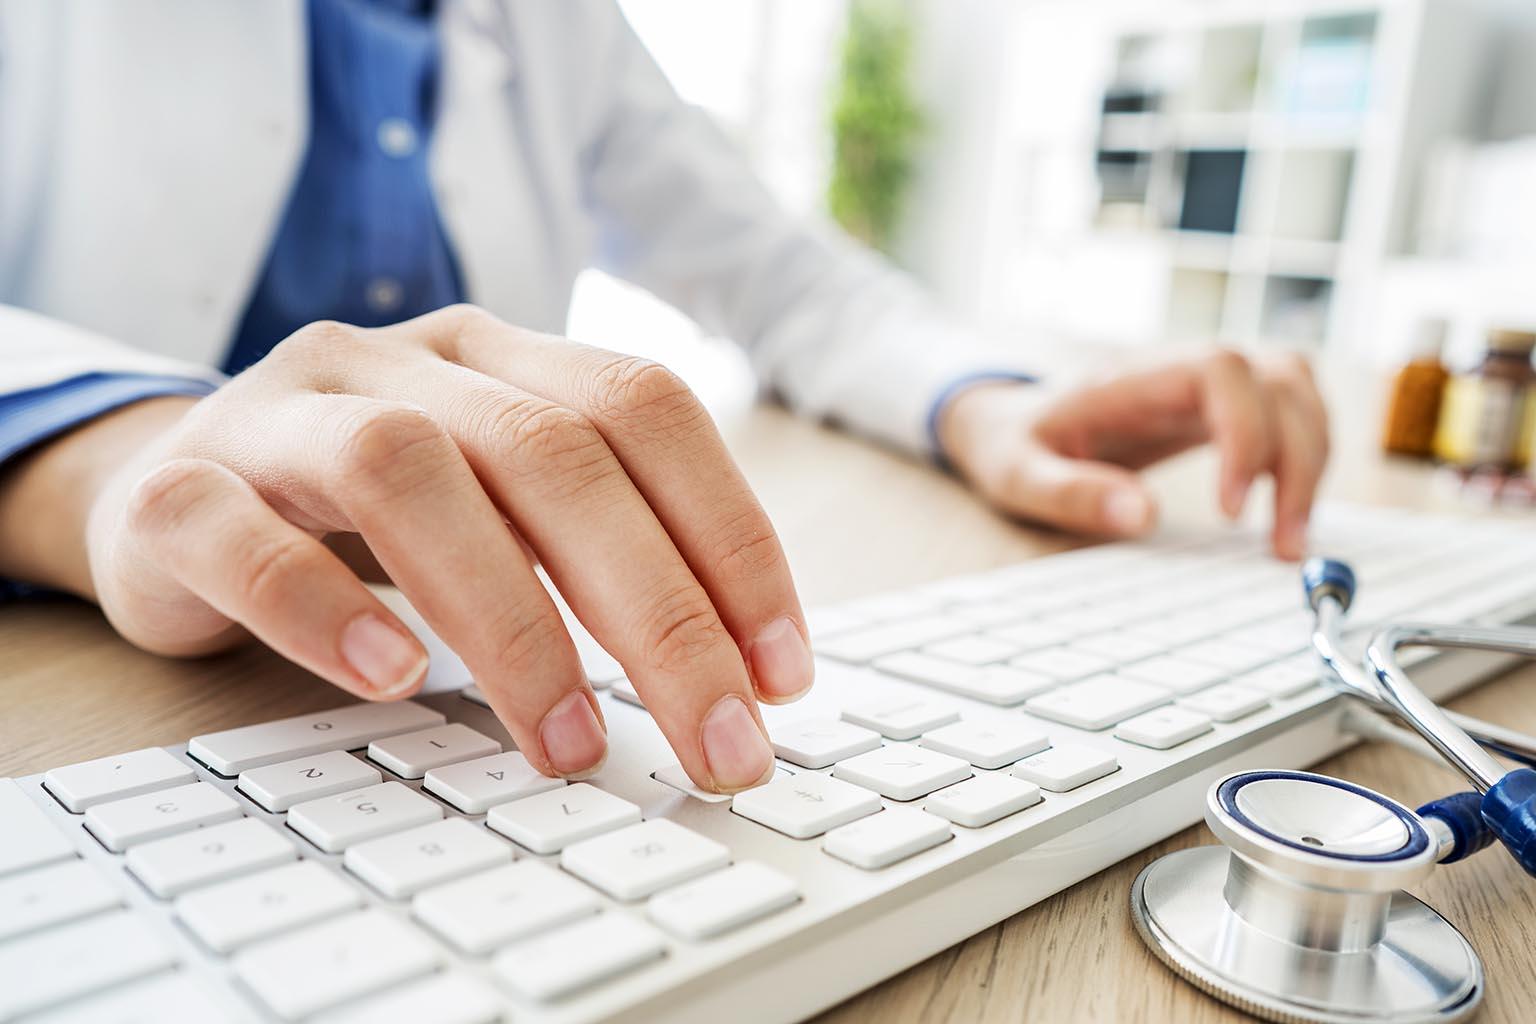 Marketing tips to recruit nurses to your higher education program